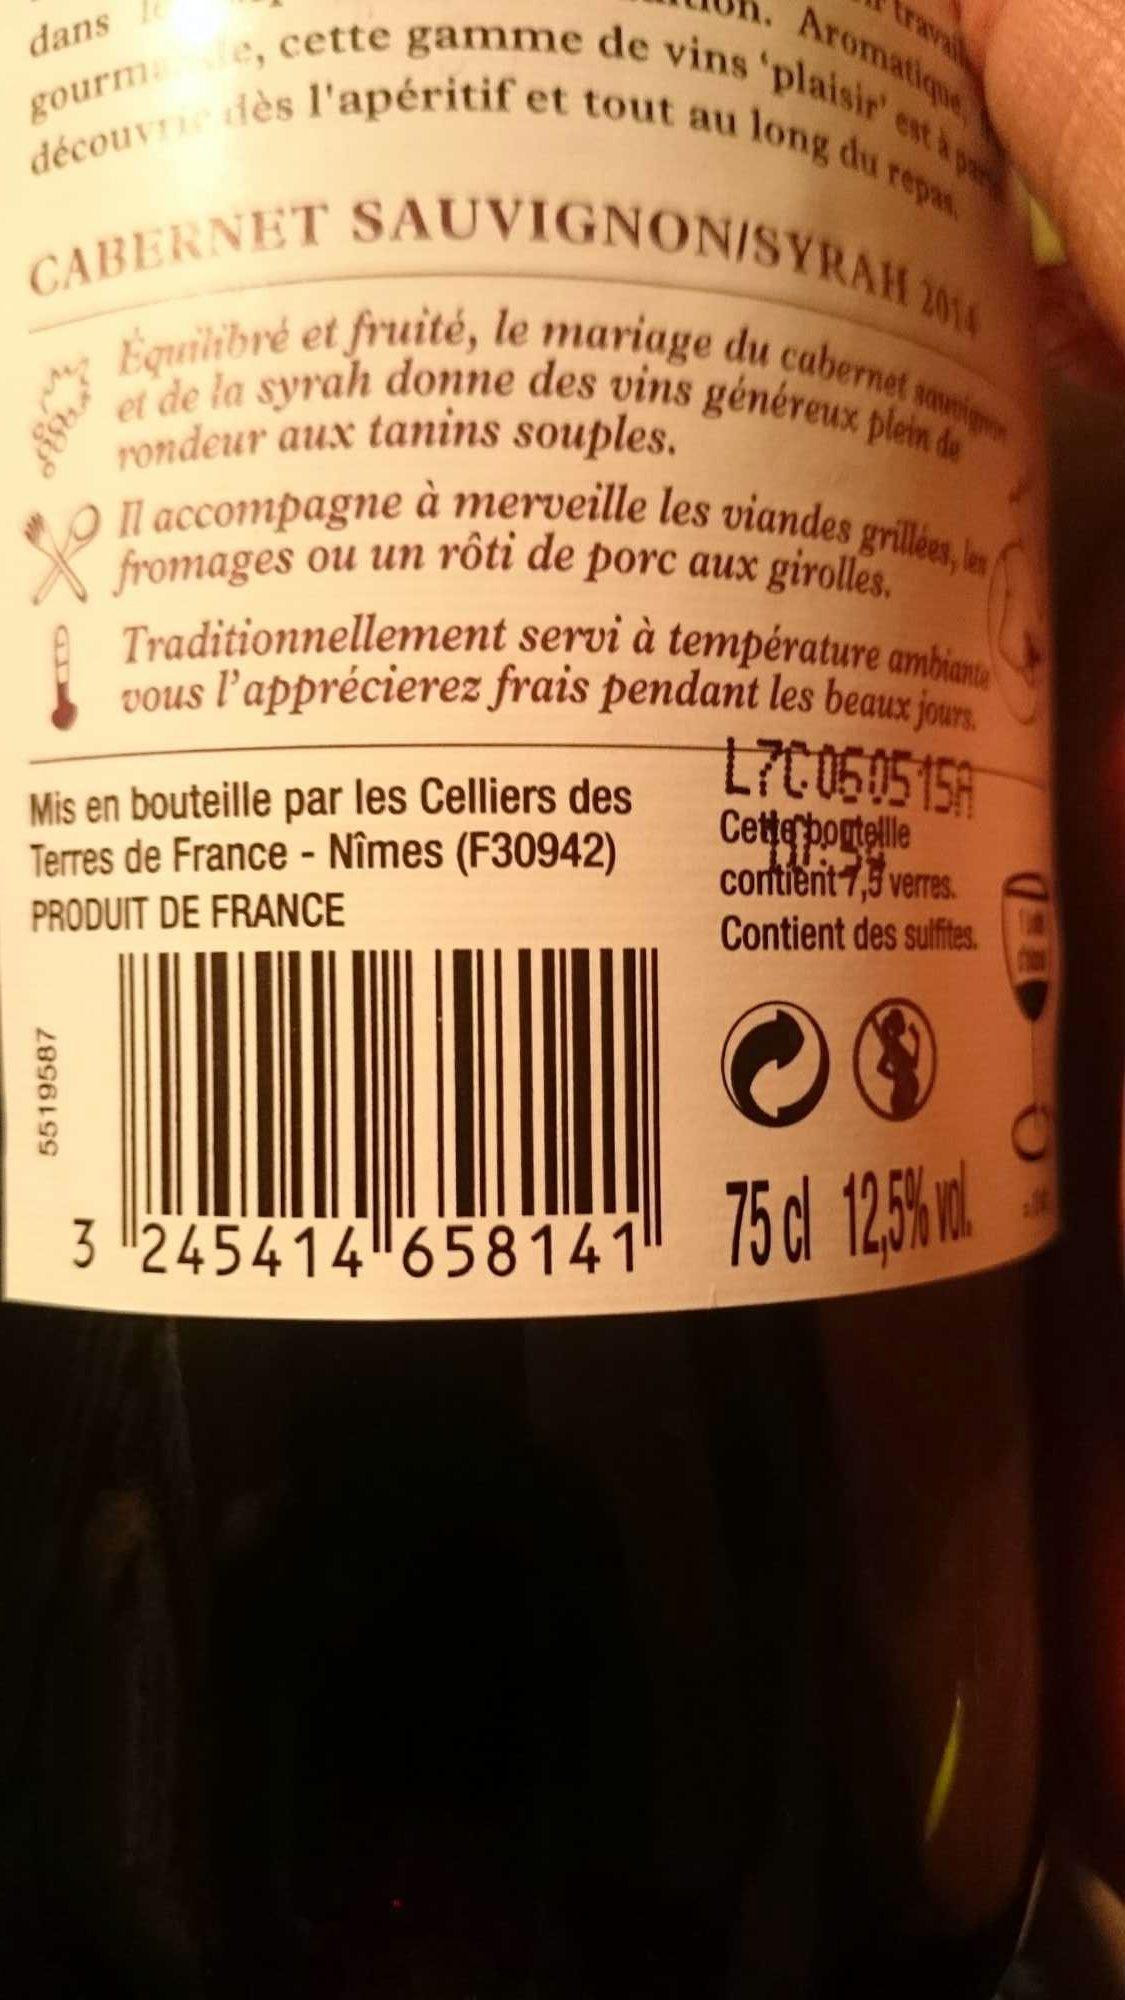 Cabernet Sauvignon/Syrah 2014 - Product